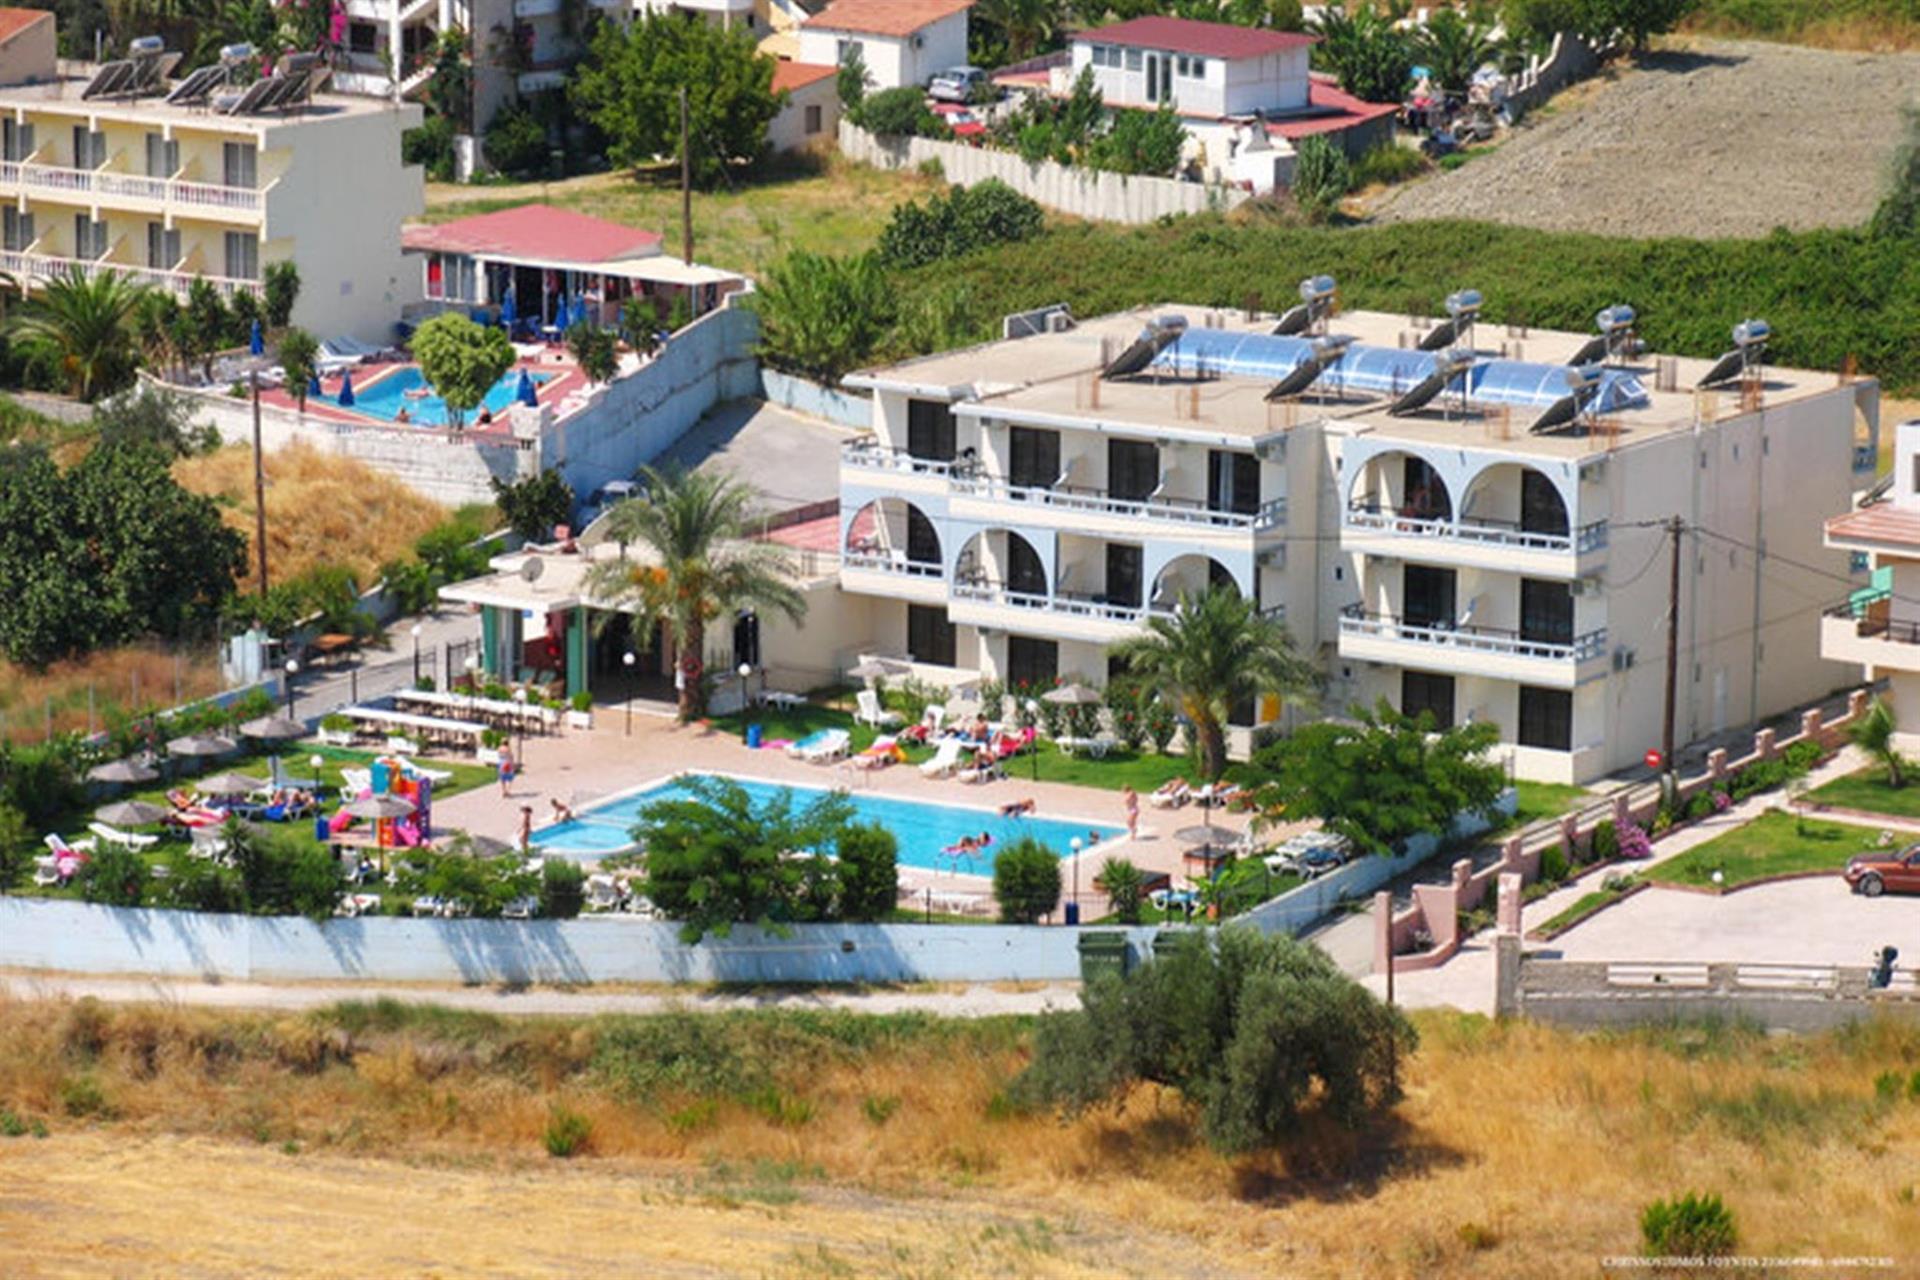 Hotels in Faliraki, Greece: review, description and tourist reviews